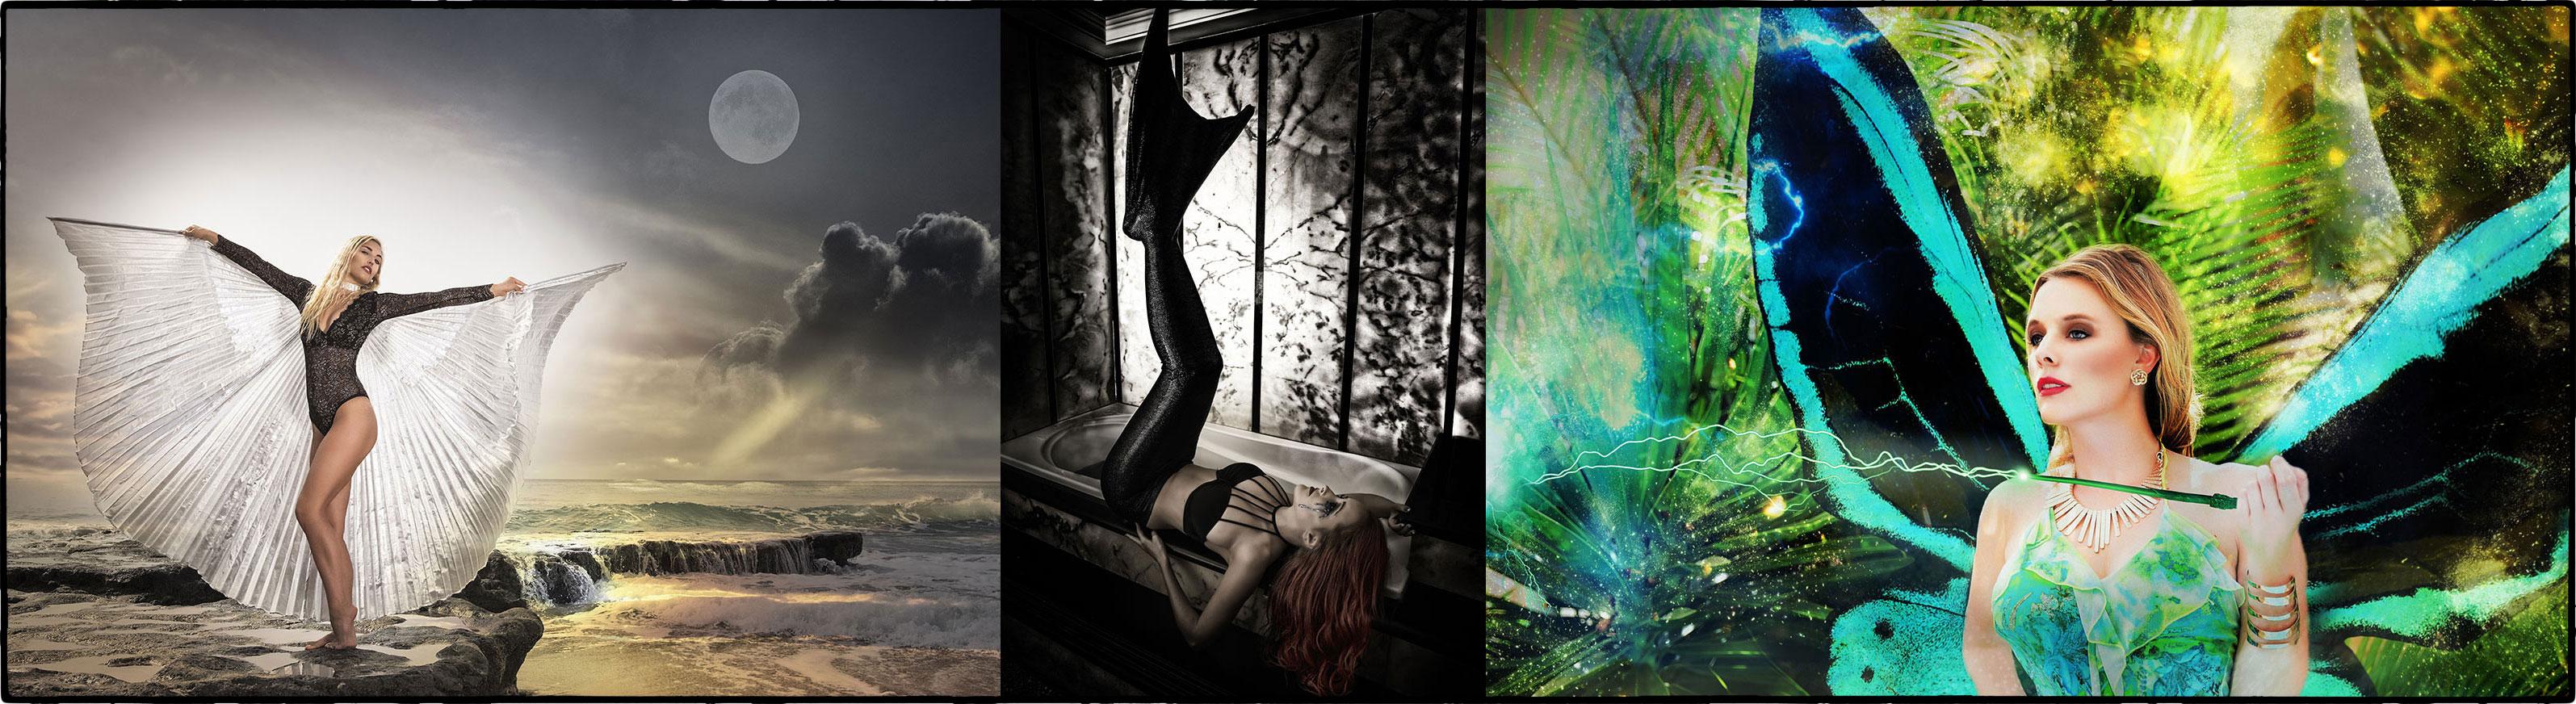 Fantasy Bilder